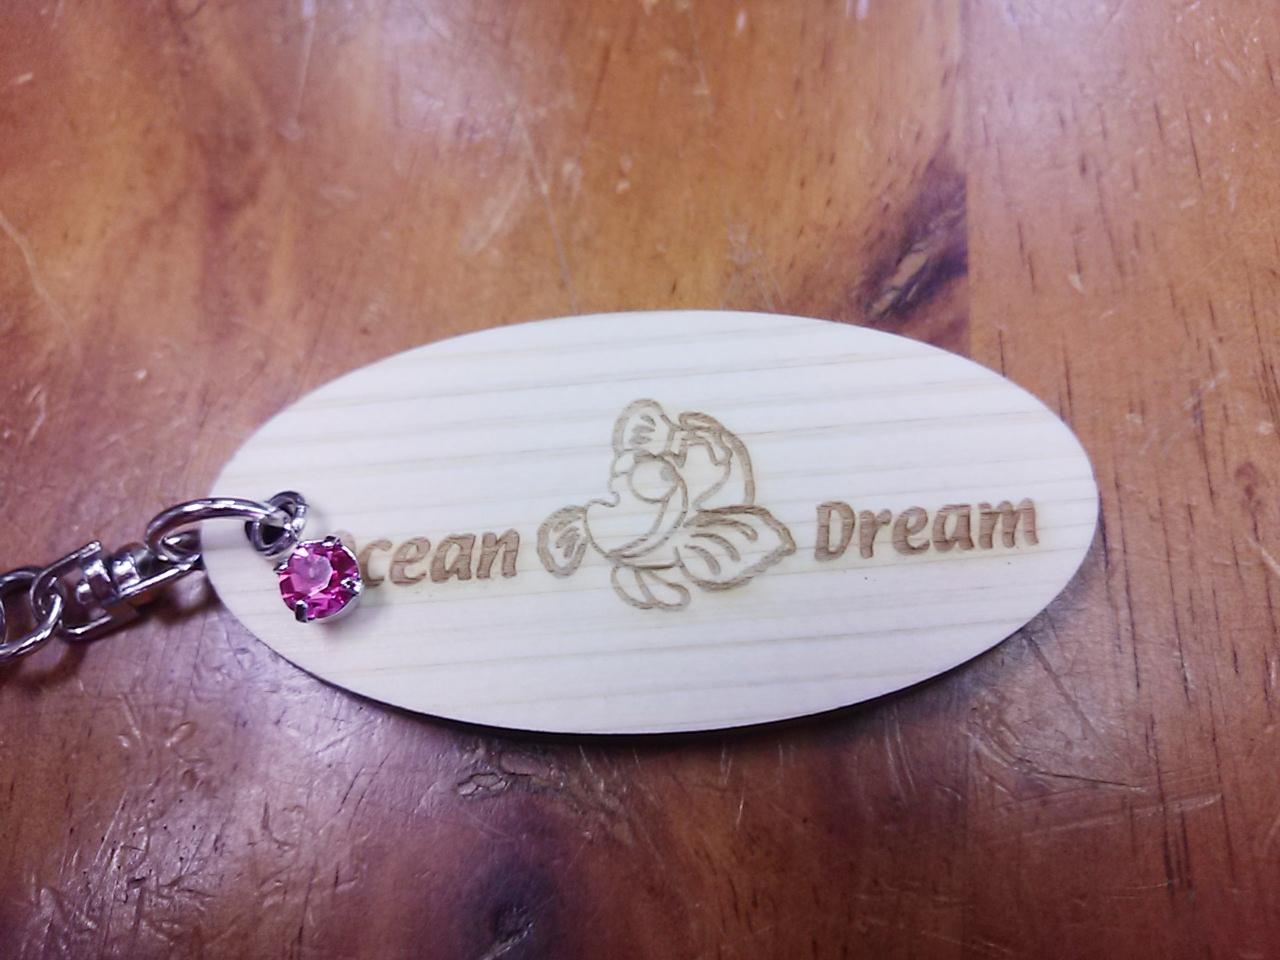 Ocean Dream オリジナルオーダーメイド商品